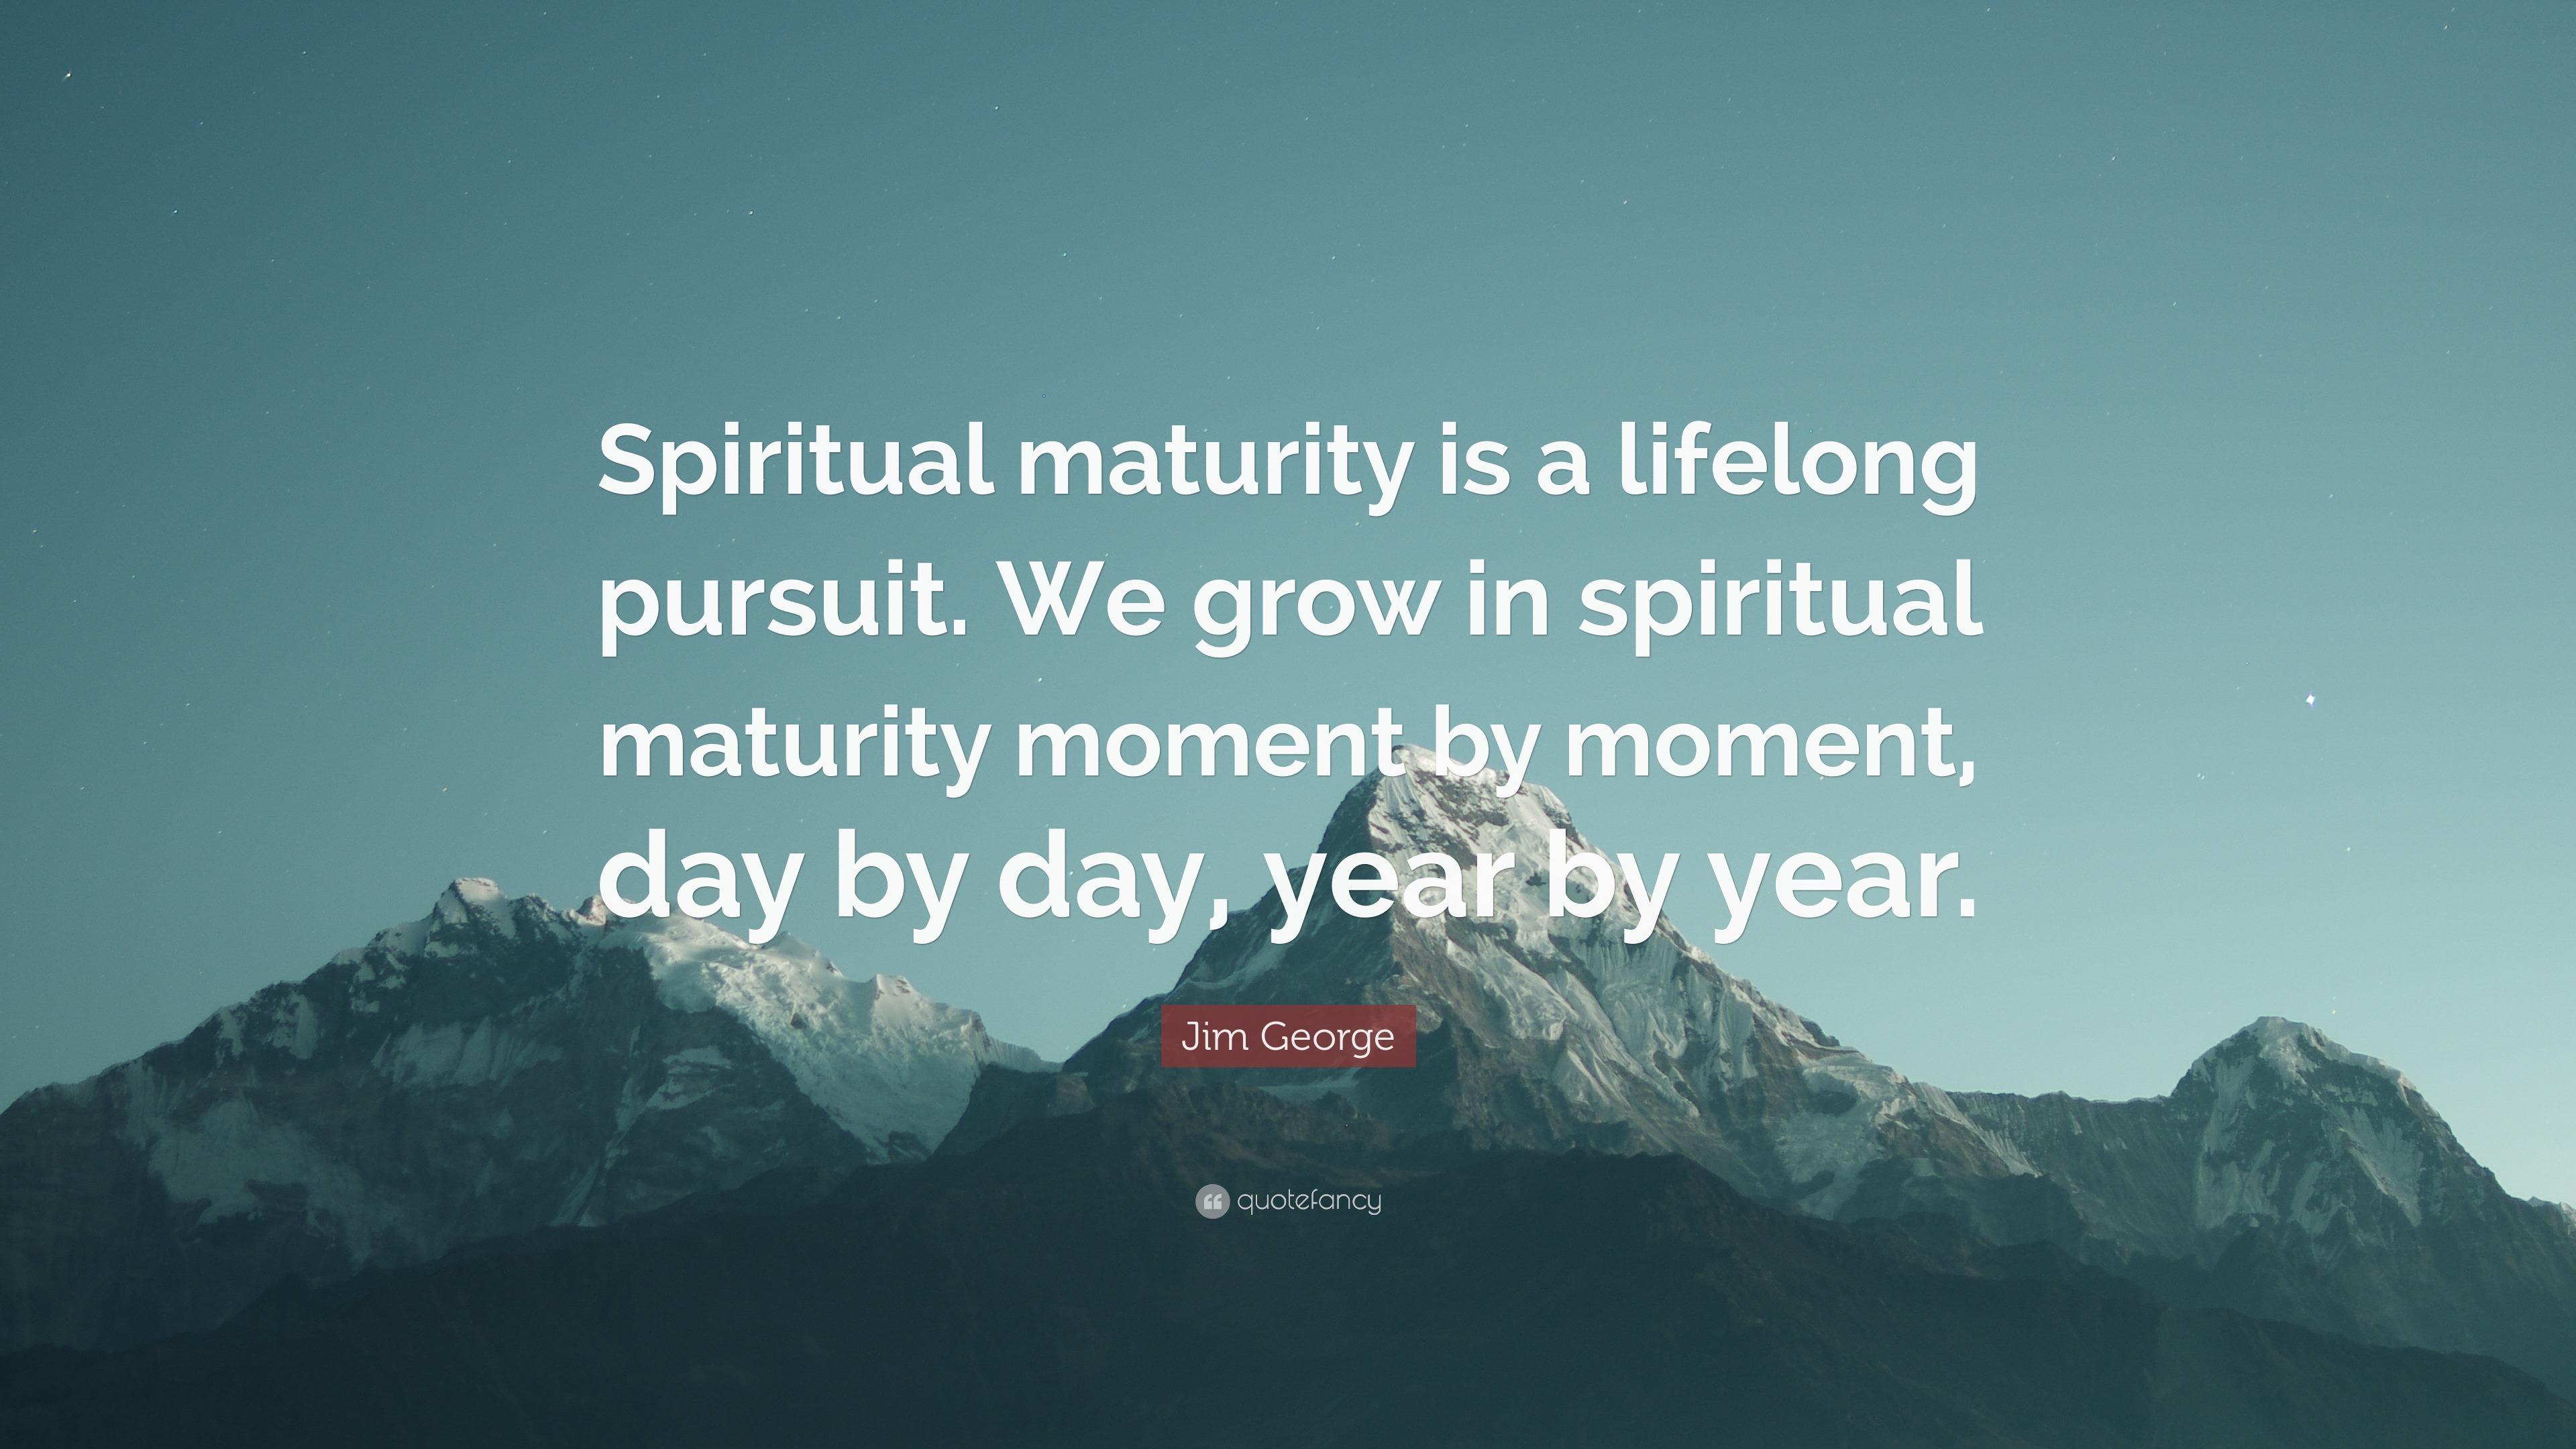 Jim George Quote: Spiritual maturity is a lifelong